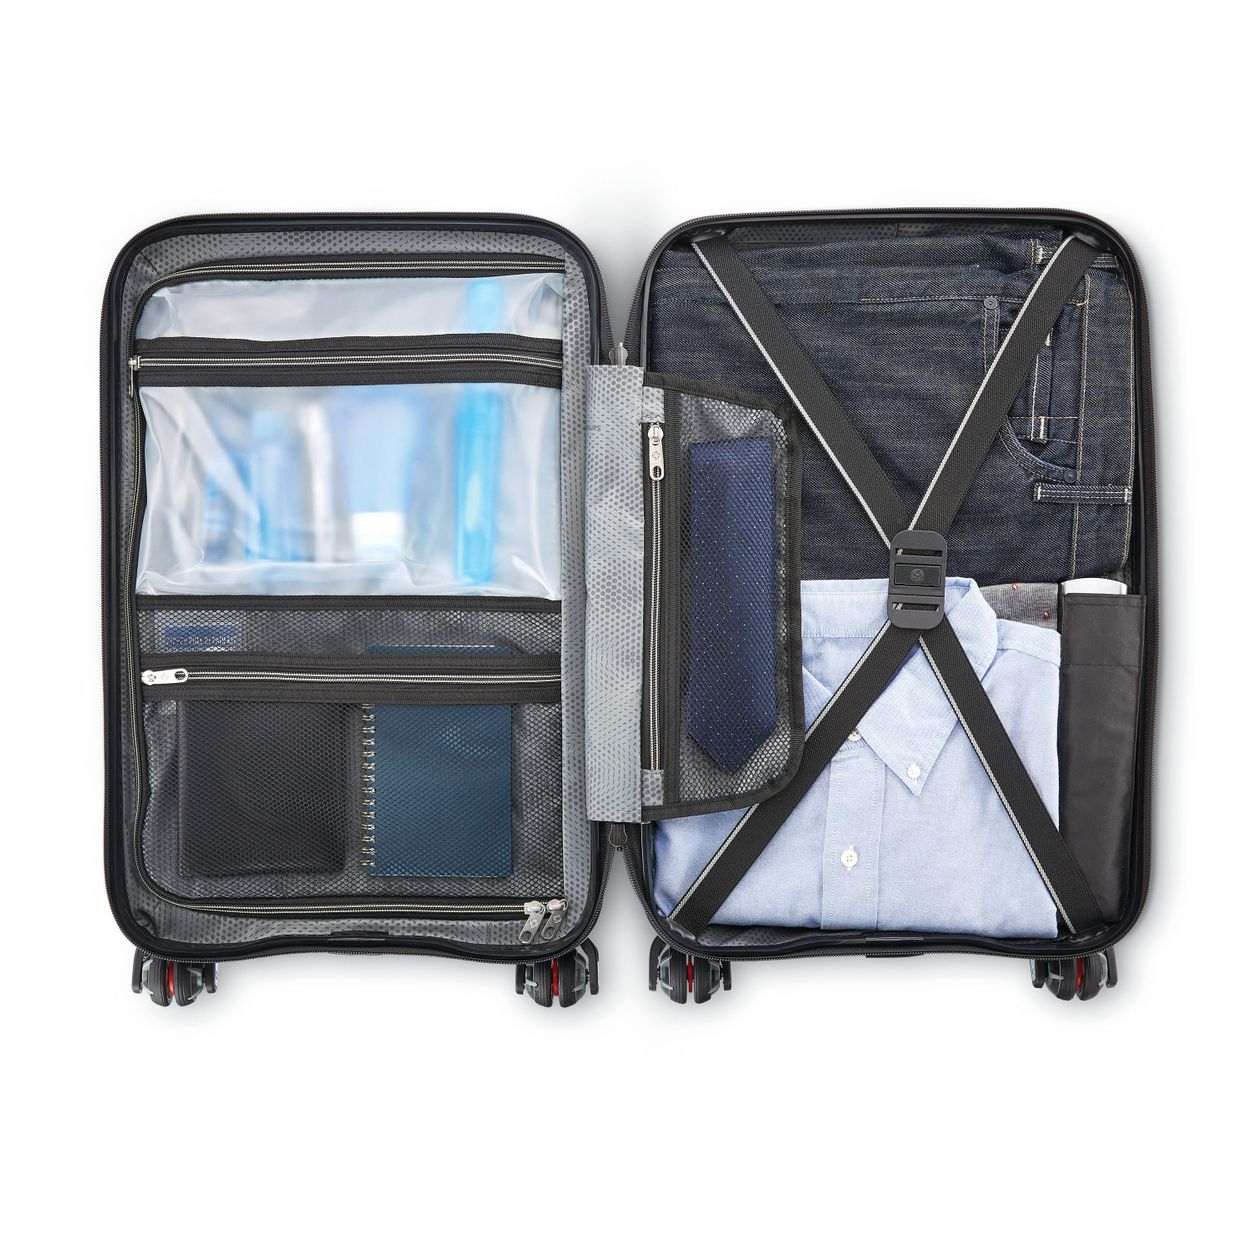 Samsonite, cross straps, organization, pockets